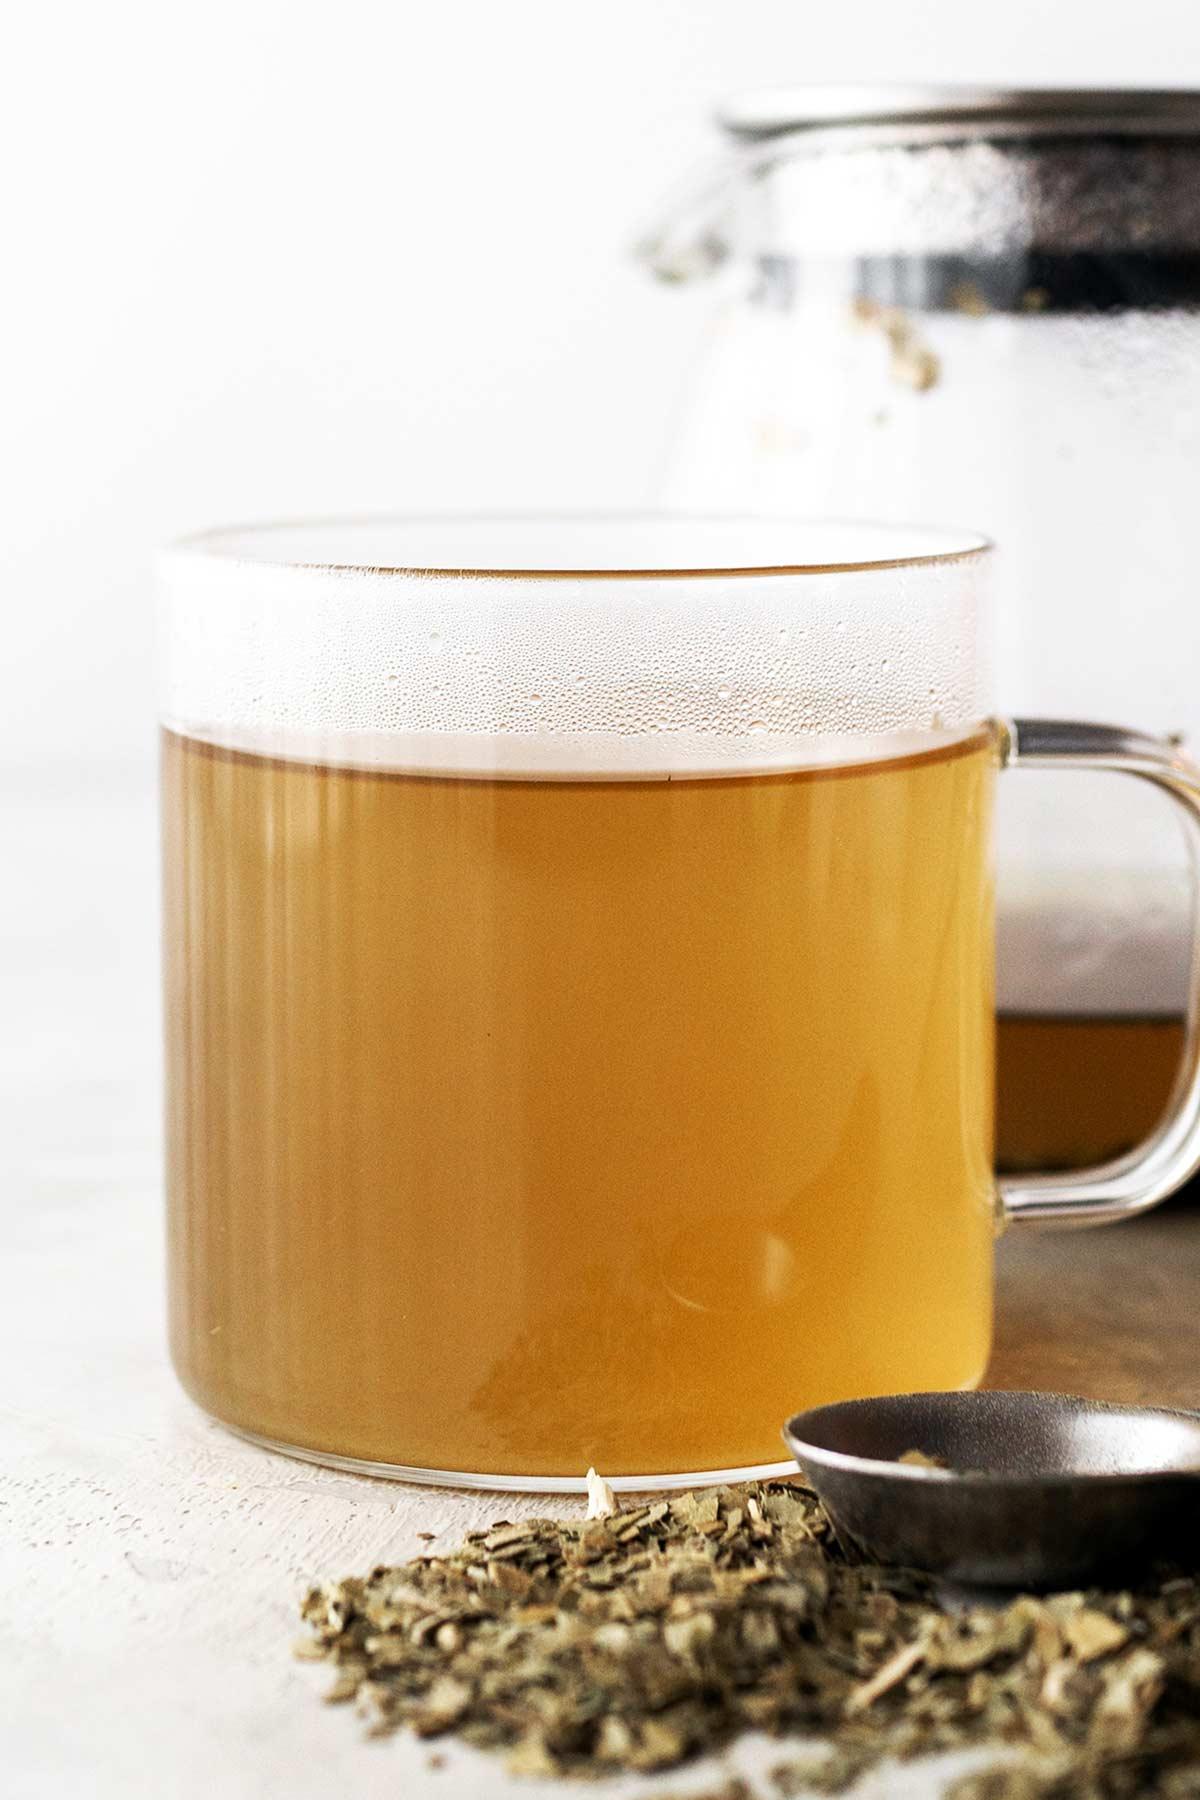 Hot yerba mate tea in a glass mug.